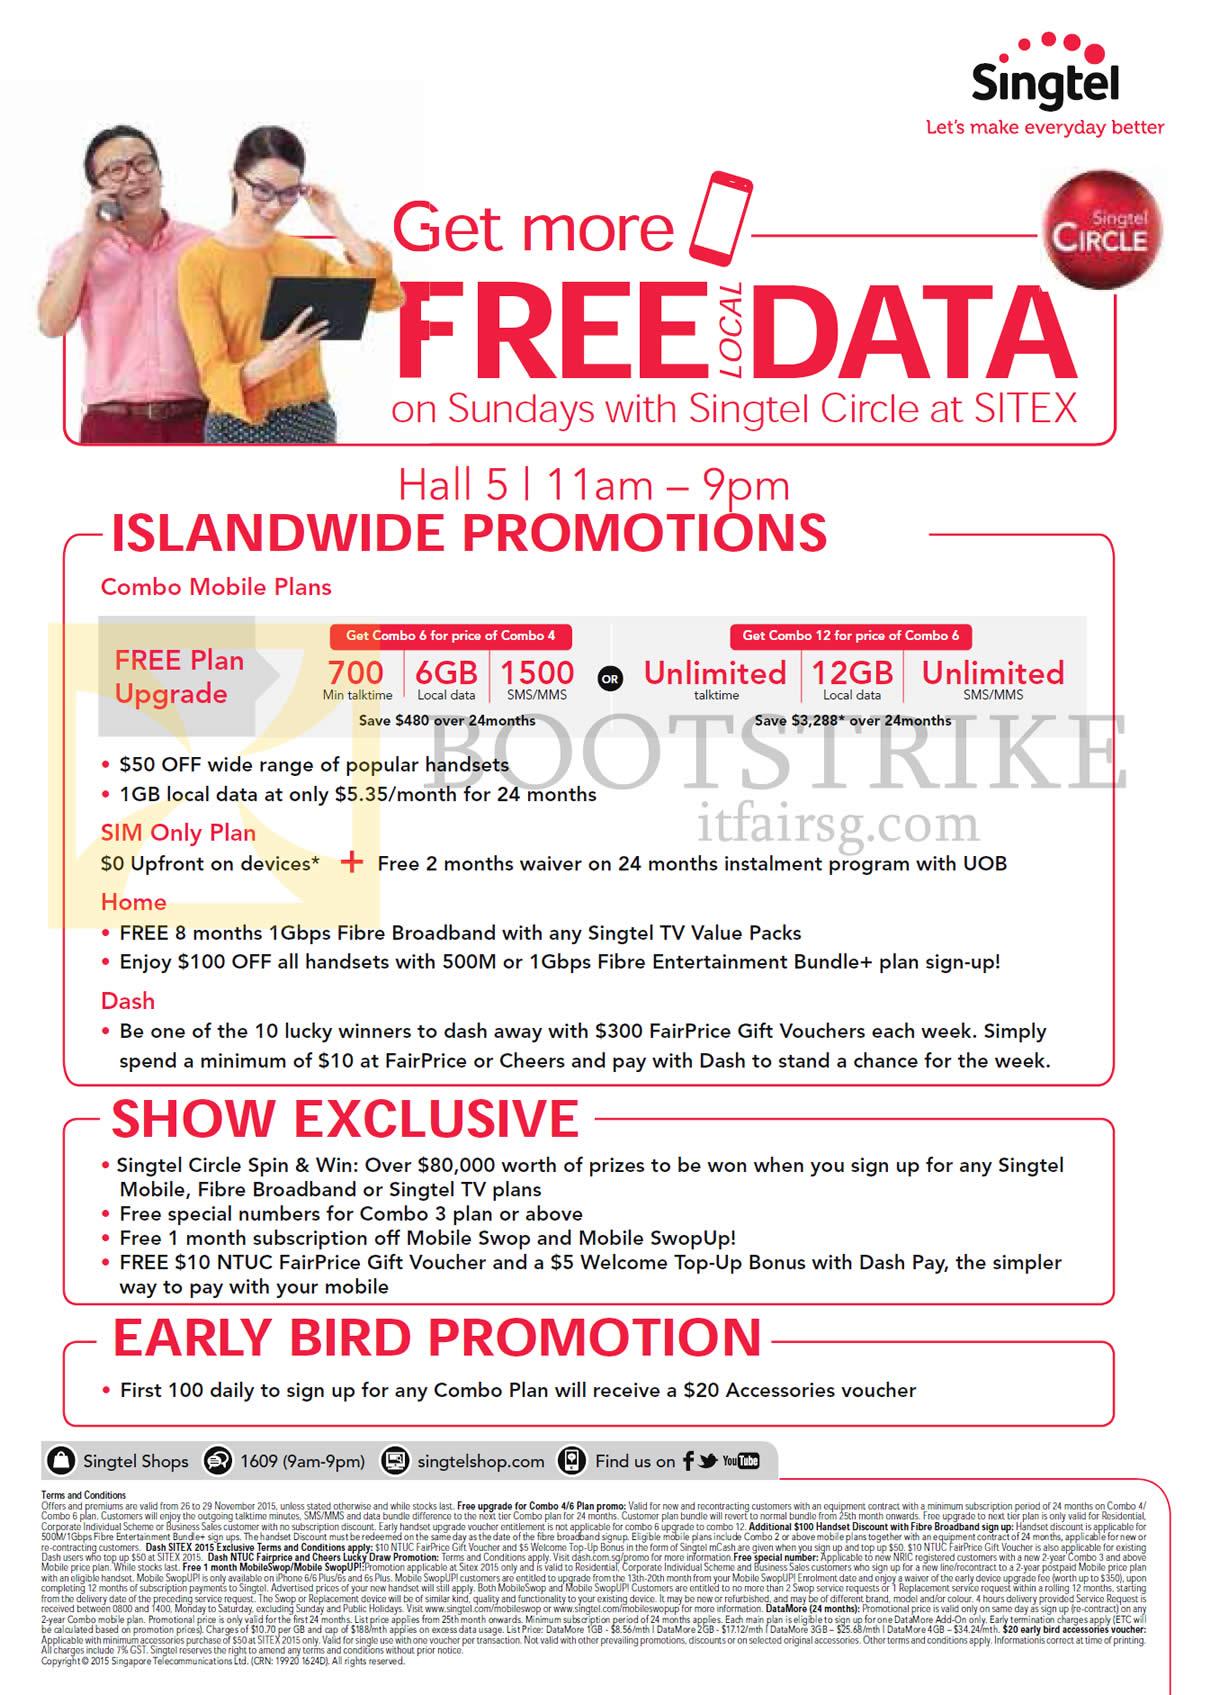 Singtel SITEX 2015 Broadband, Mobile & TV Offers 26 – 29 Nov